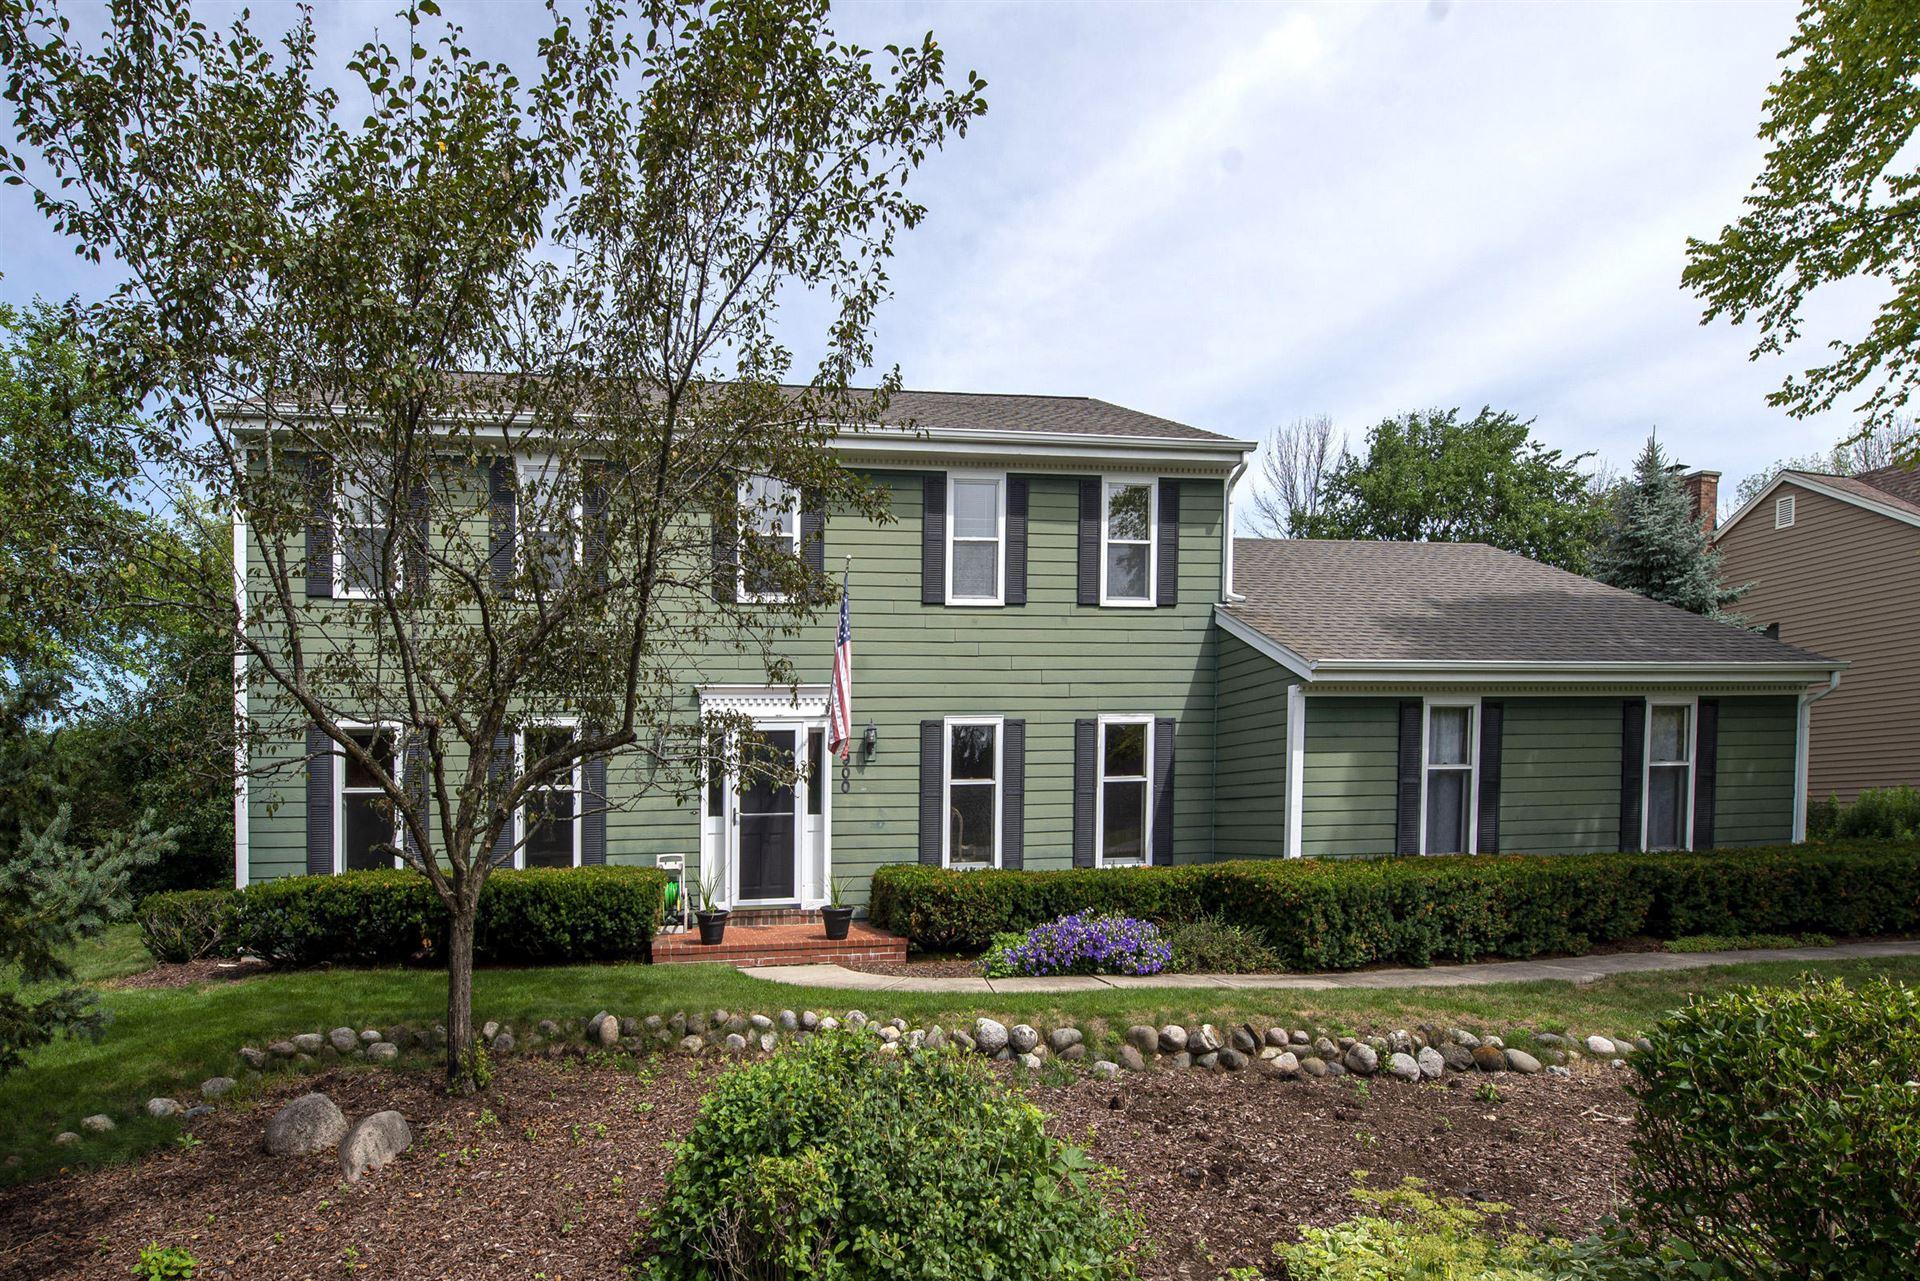 14900 Woodland Pl, Brookfield, WI 53005 - #: 1700173